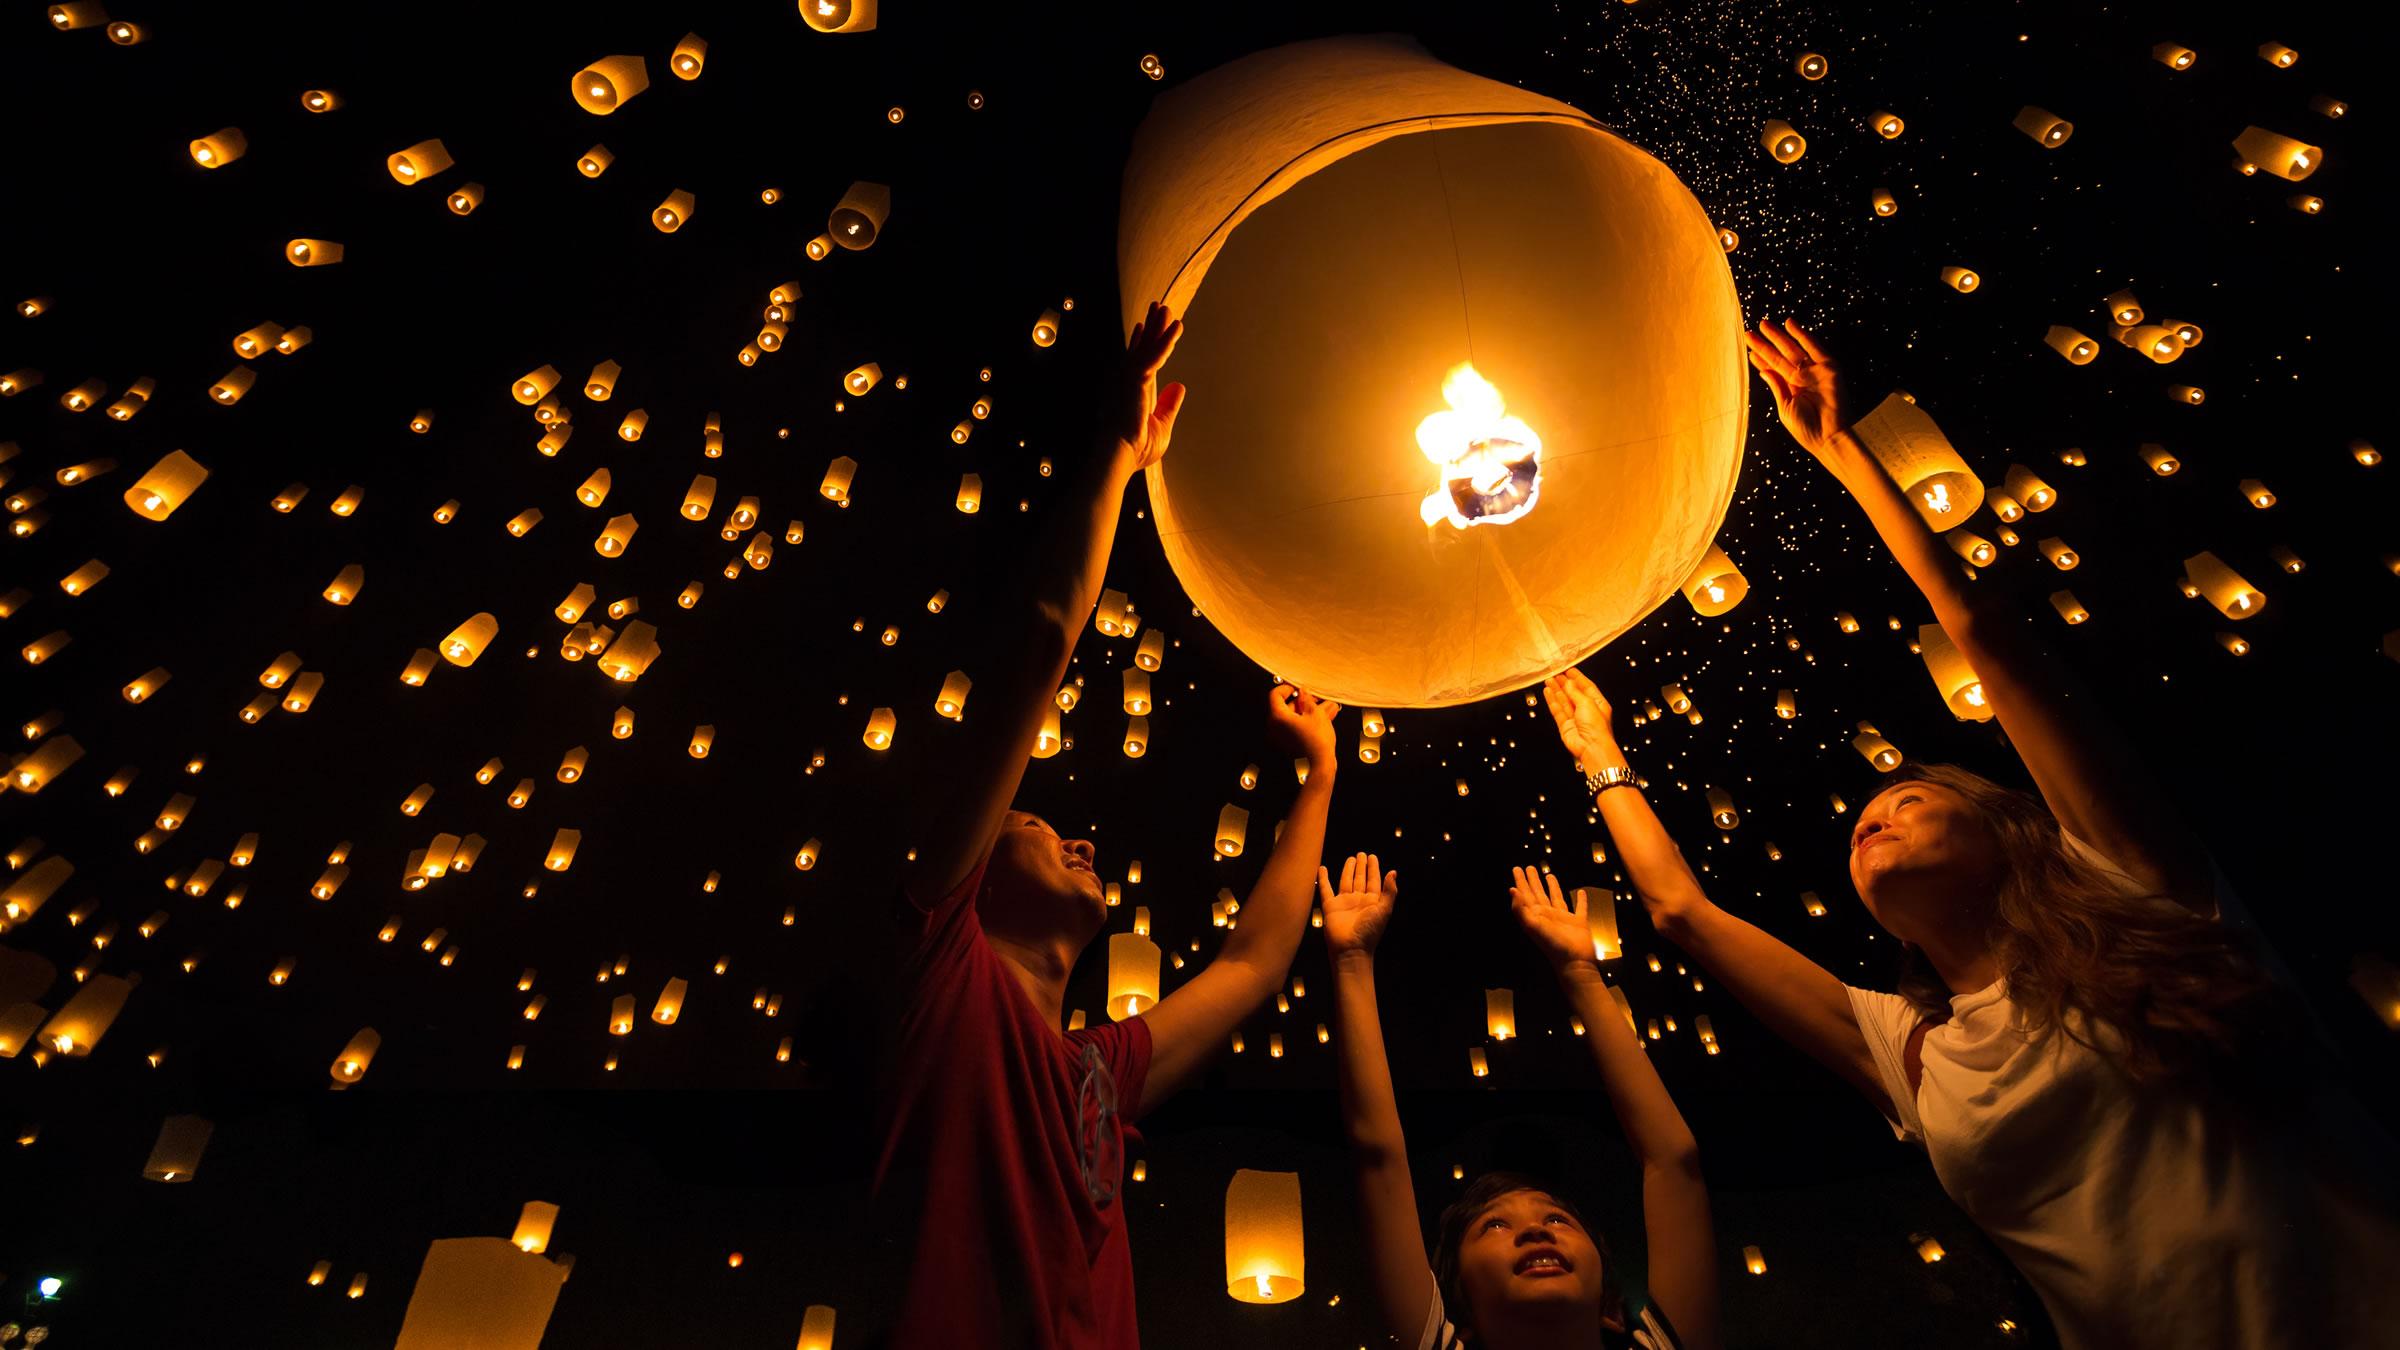 Globos de papel de seda en China y Taiwán - آشنایی با جشن های بین المللی دنیا